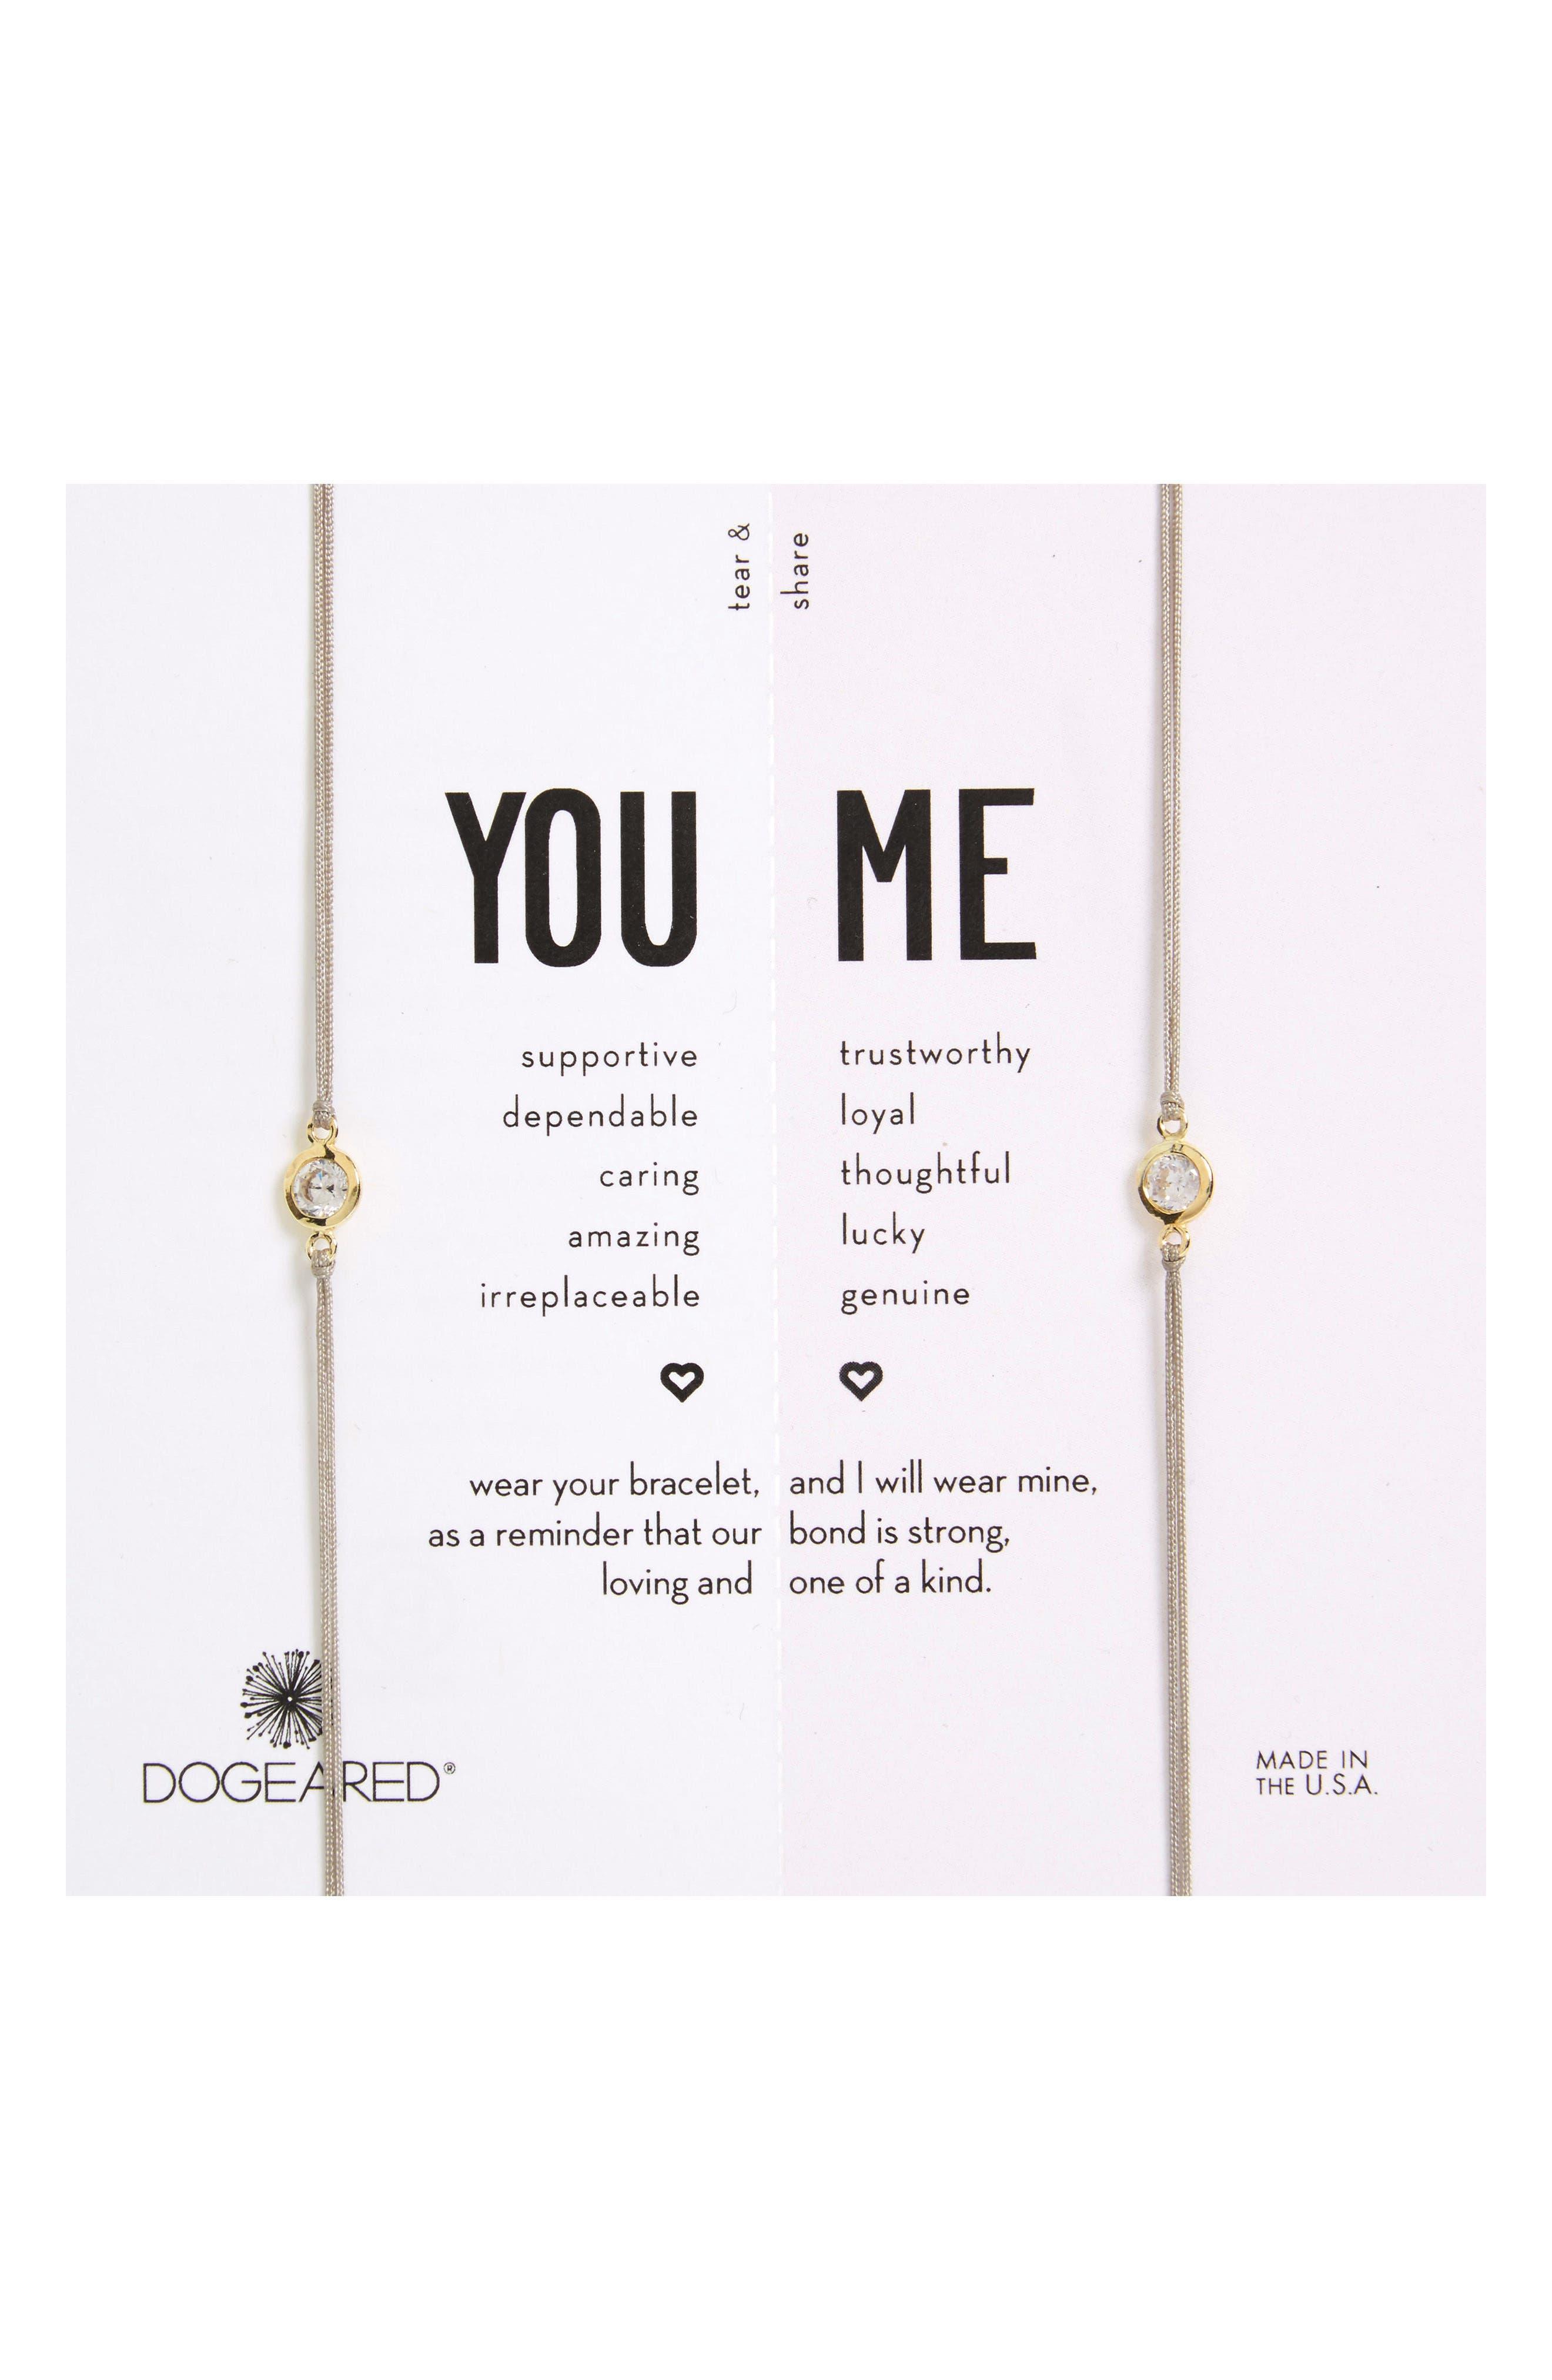 You & Me Set of 2 Crystal Charm Friendship Bracelets,                             Main thumbnail 1, color,                             250